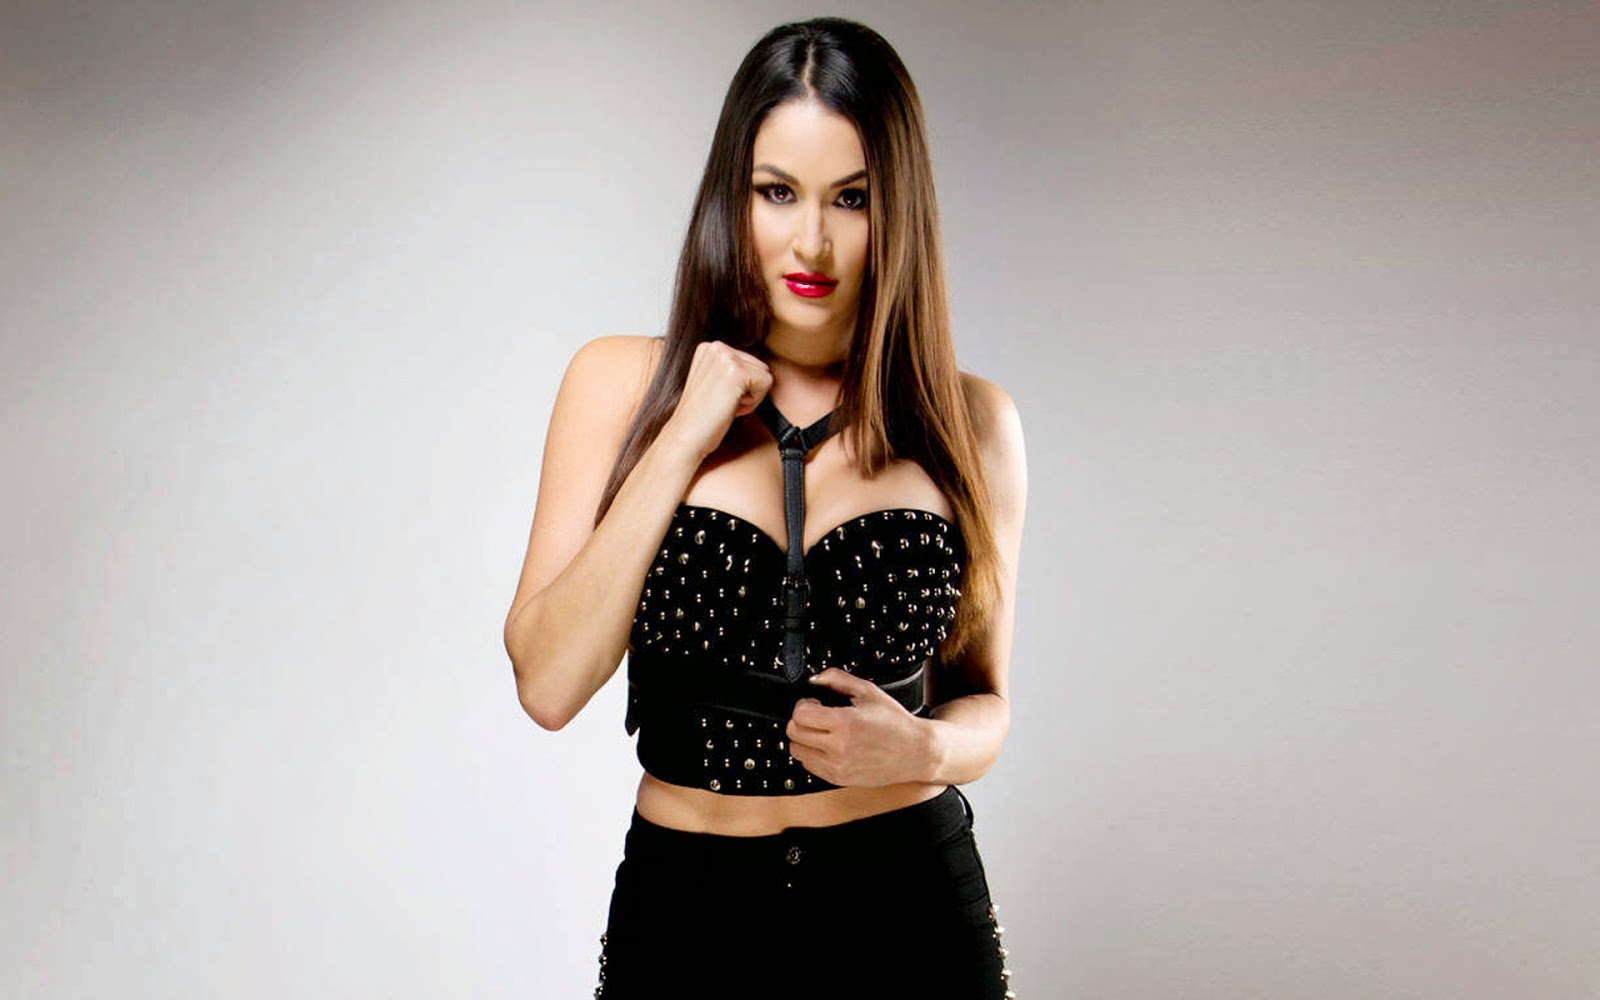 Wwe Divas Images And Latest Sports News Nikki Bella High